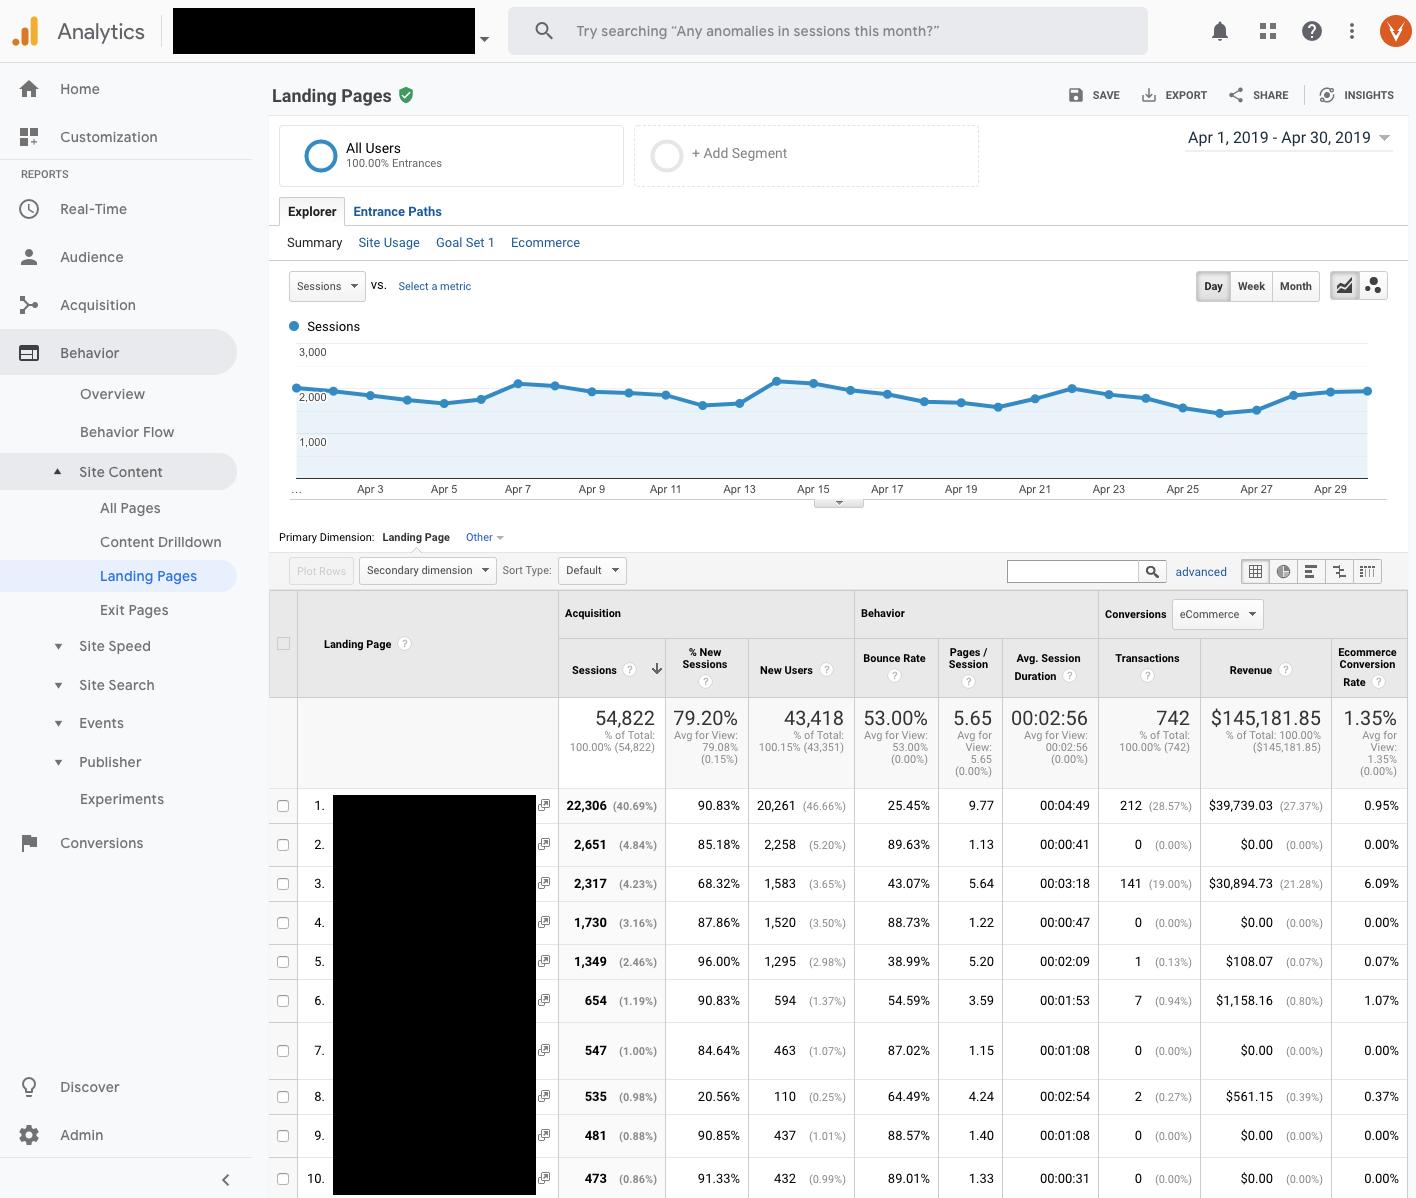 Site Content Landing Pages